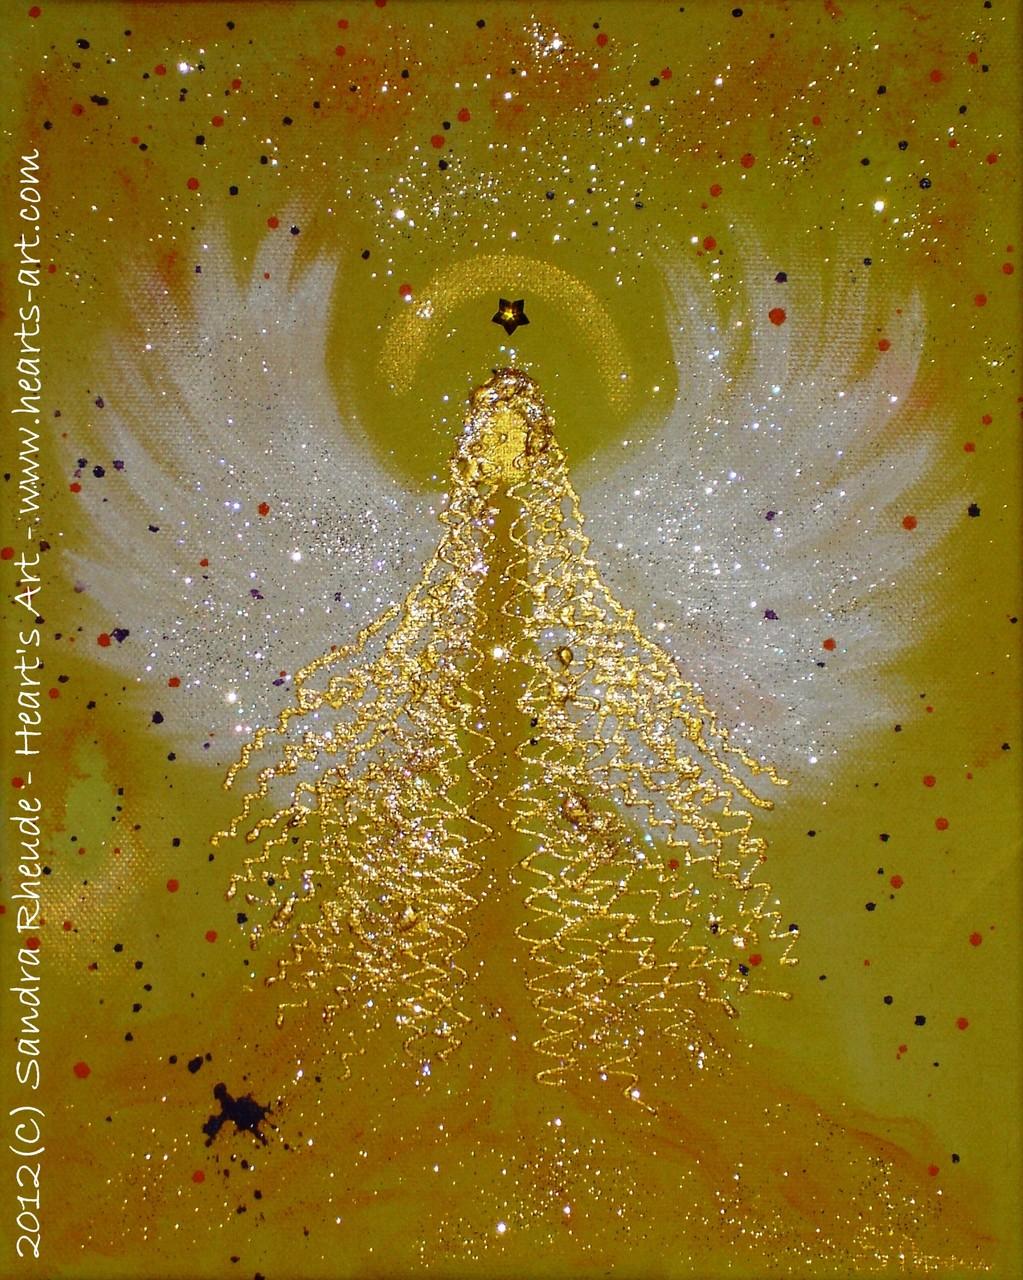 Kinder-Schutzengel 'Sweet Honey' - 2012/42 - Acryl auf Leinwand - 24 x 30 cm - verkauft